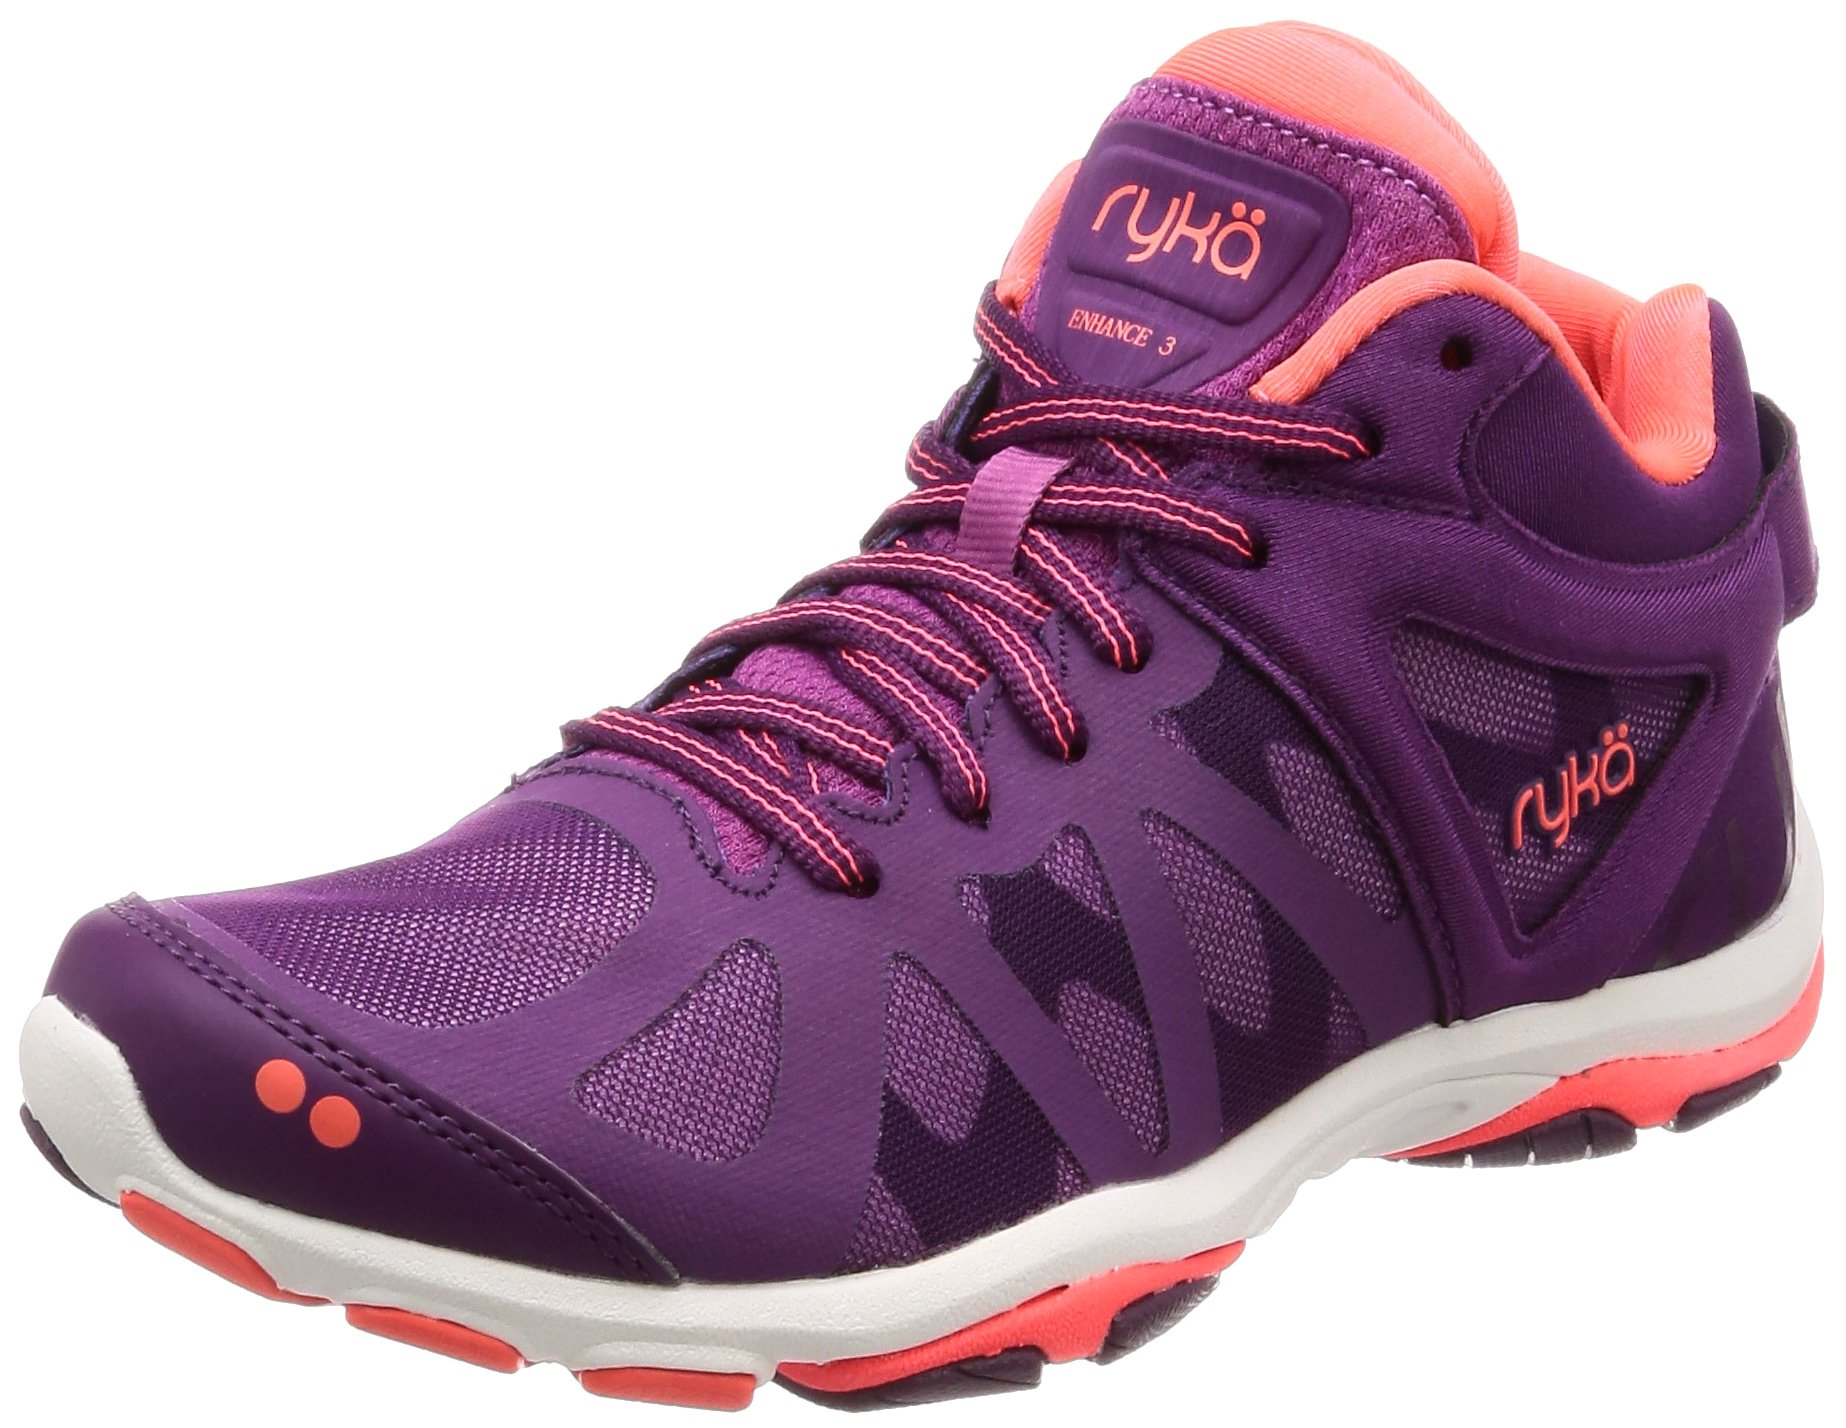 Ryka Womens Enhance 3 Training Shoe, Grape Juice, 7 B(M) US